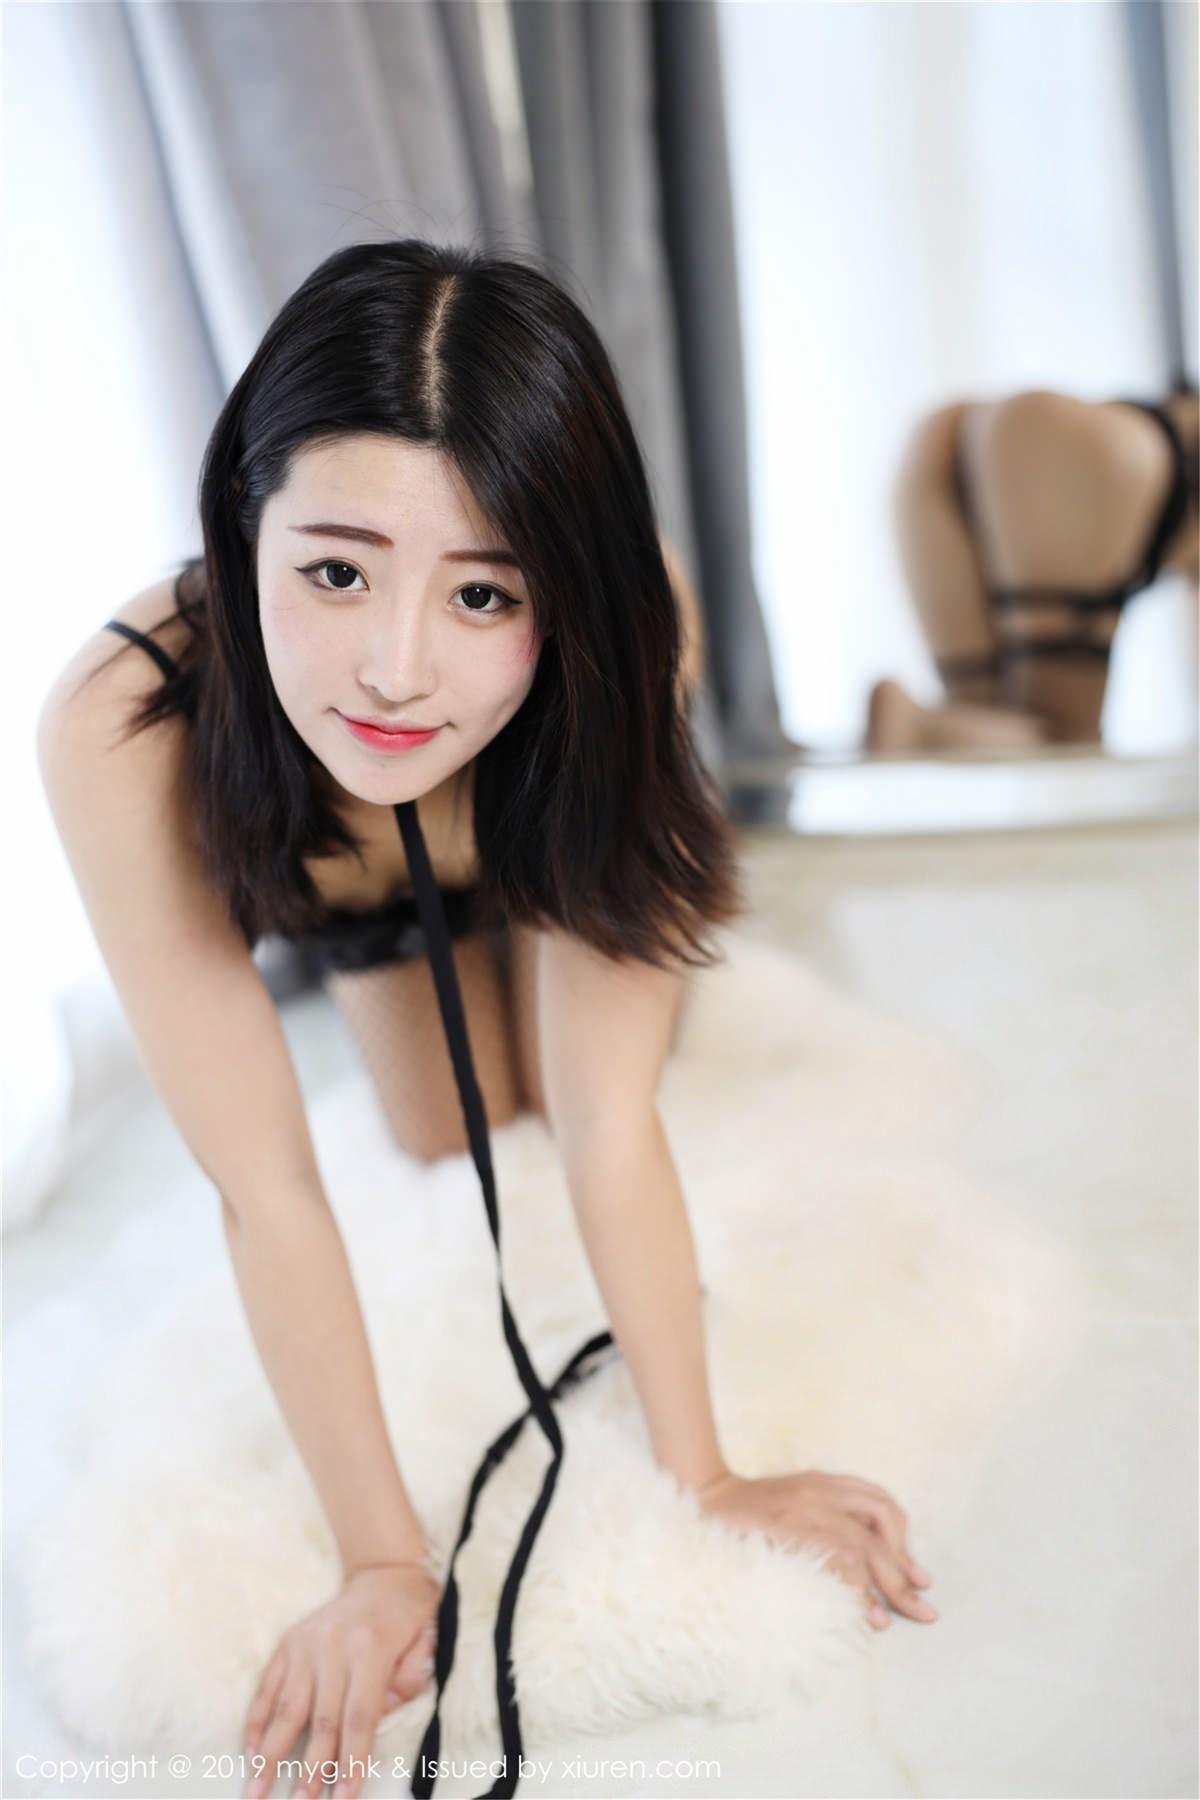 MyGirl Vol.358 31P, mygirl, Tong Dan Na